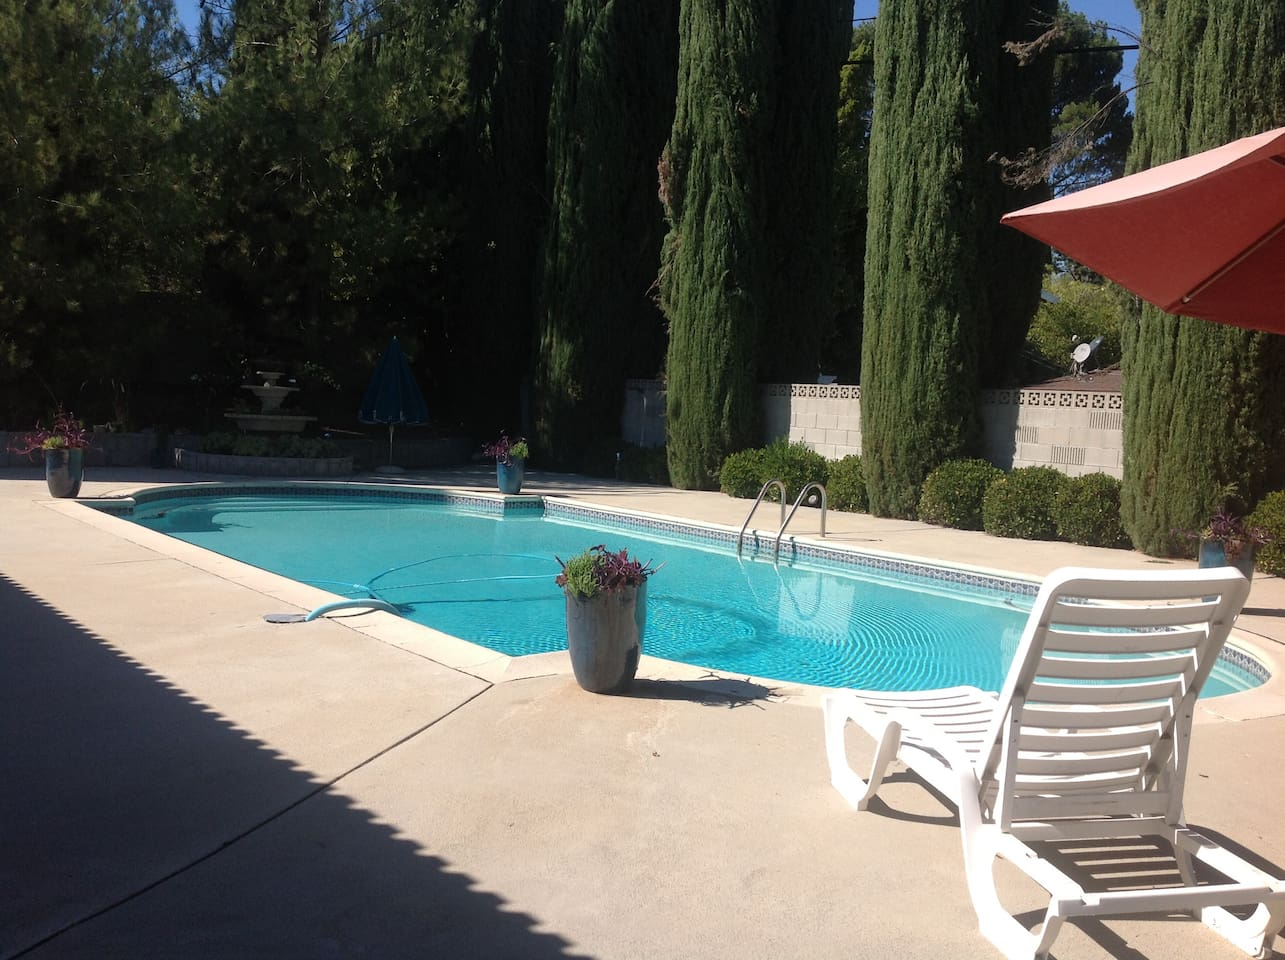 Refreshing pool awaits!